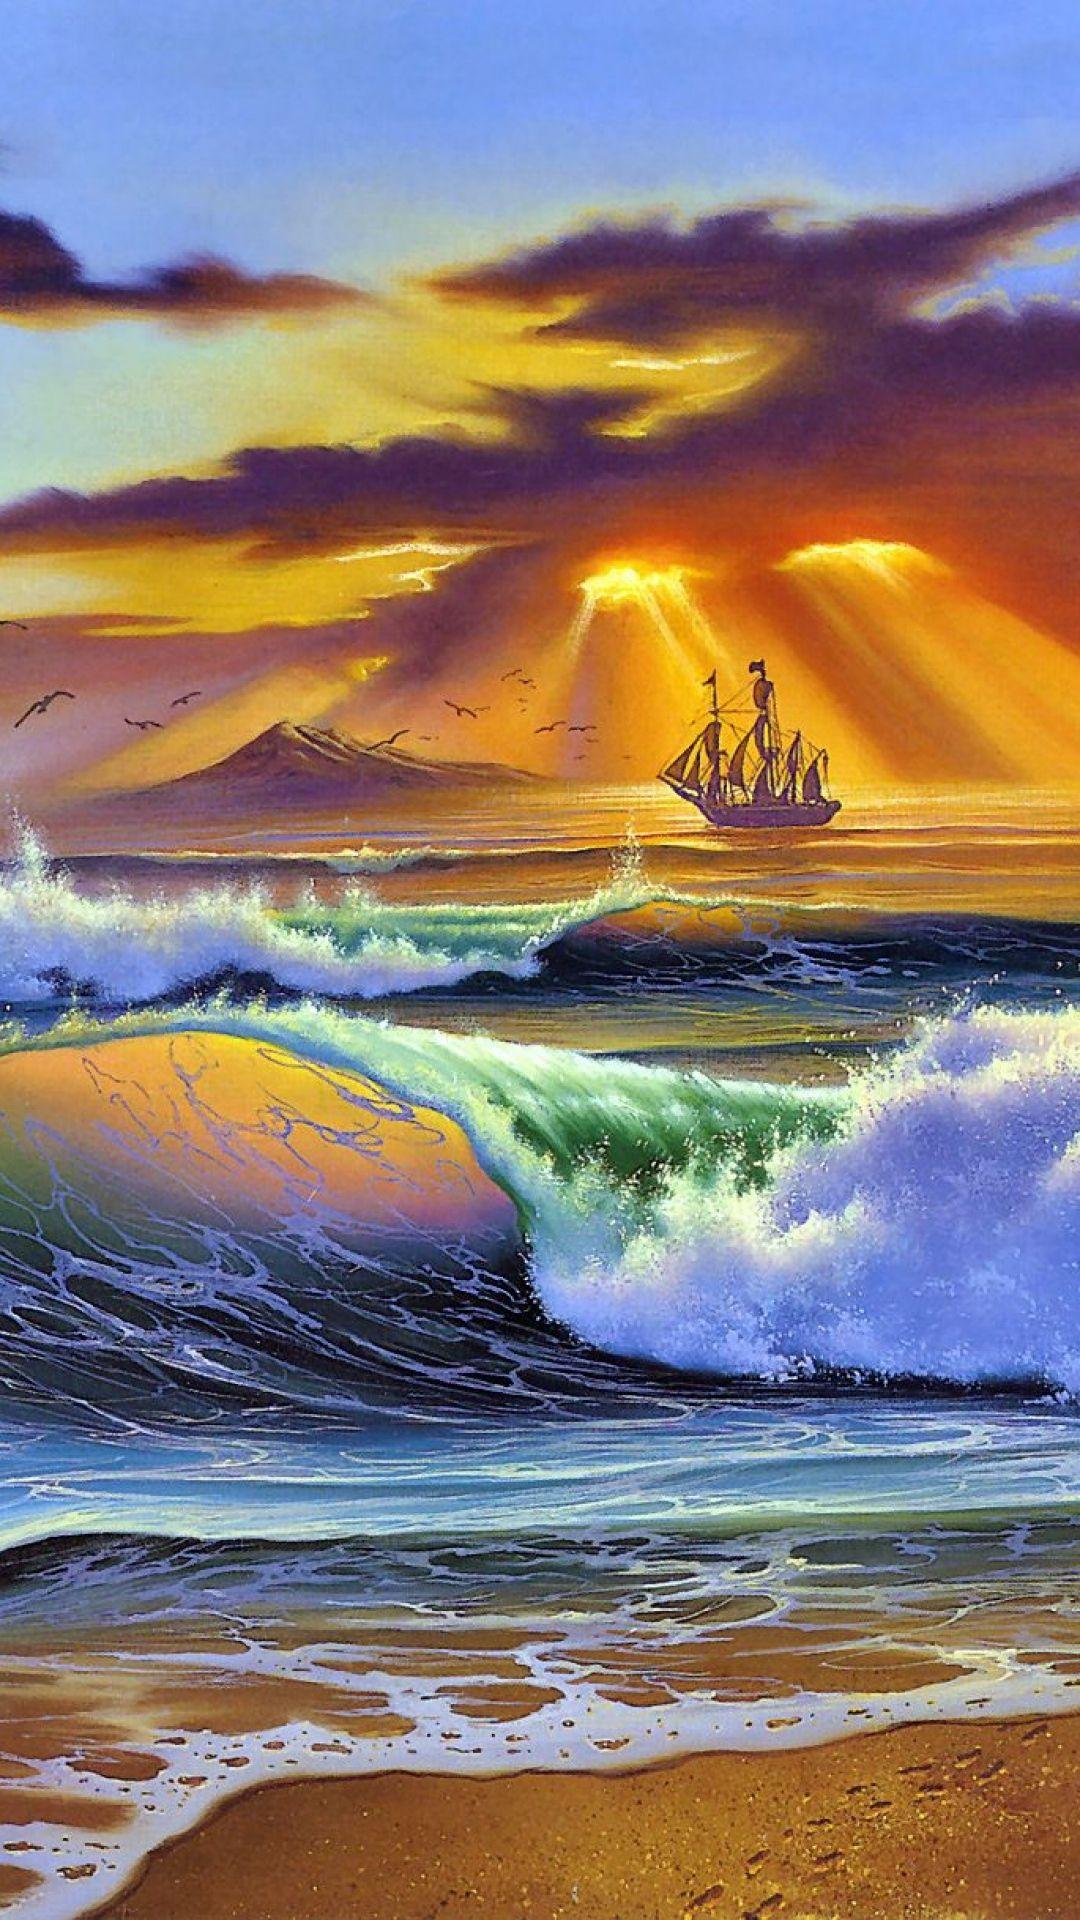 sea, beach, art, painting, craft, sun, rays, evening, storm